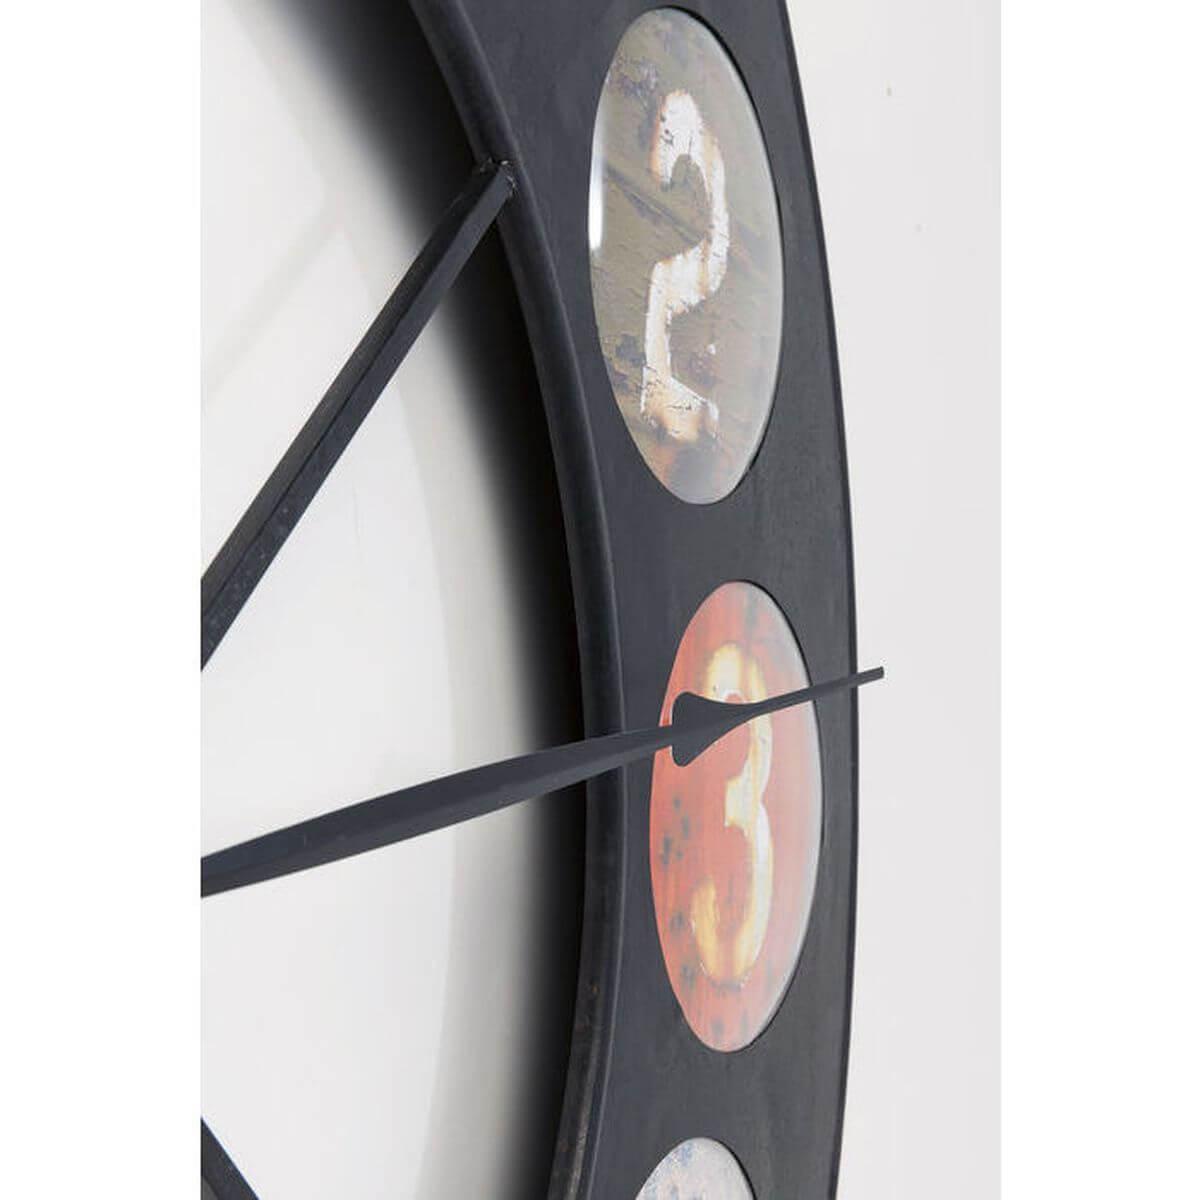 VINTAGE COLOR by KARE Horloge 119 cm